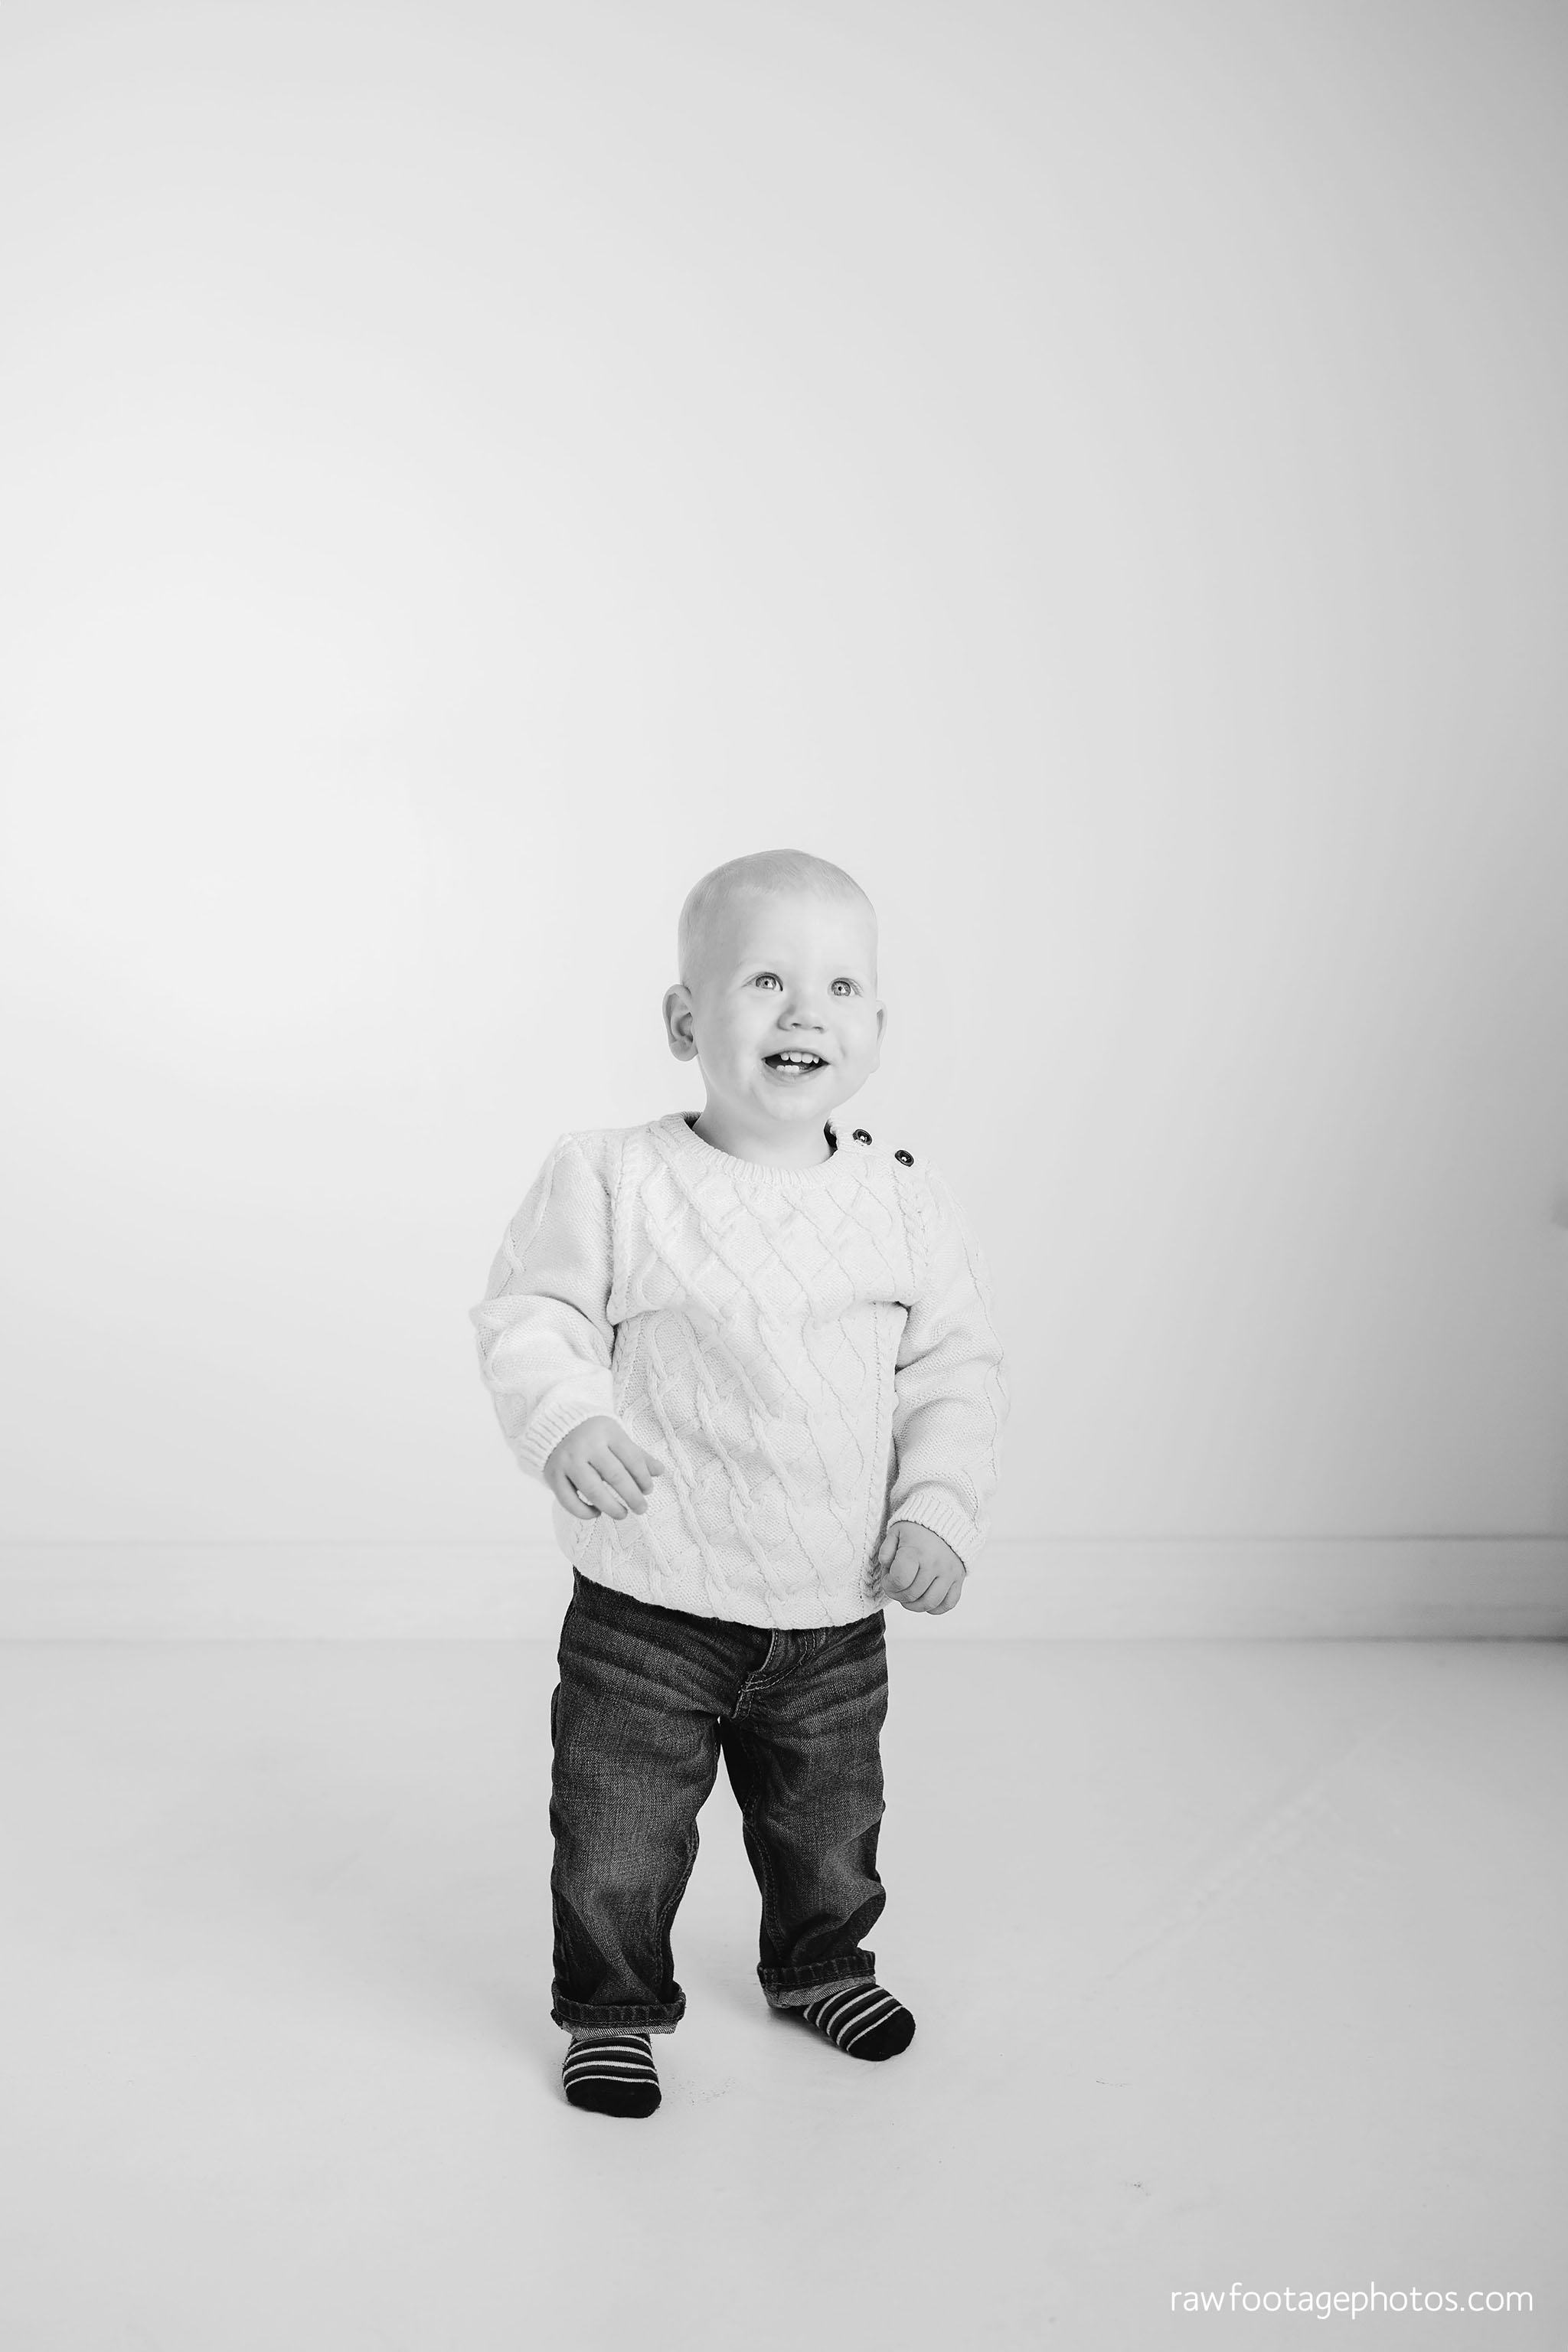 london_ontario_family_photographer-studio_photography-studio_lifestyle_portraits-white_studio-mother_son-candid_family_photography-raw_footage_photography046.jpg